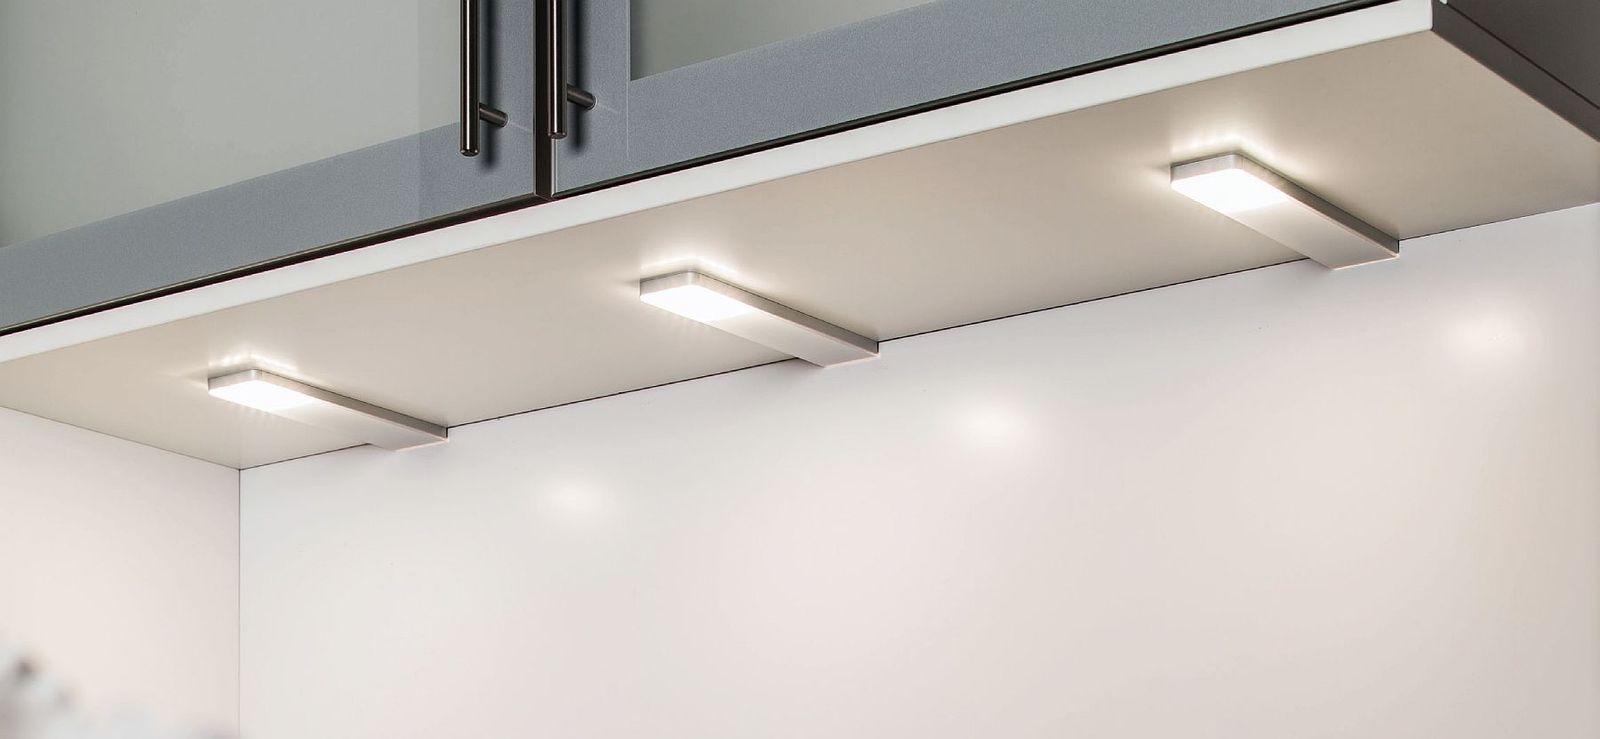 Led 2 Er Unterbau Leuchten Set Kuche 2 X 5 W Alu Konverter Sensor